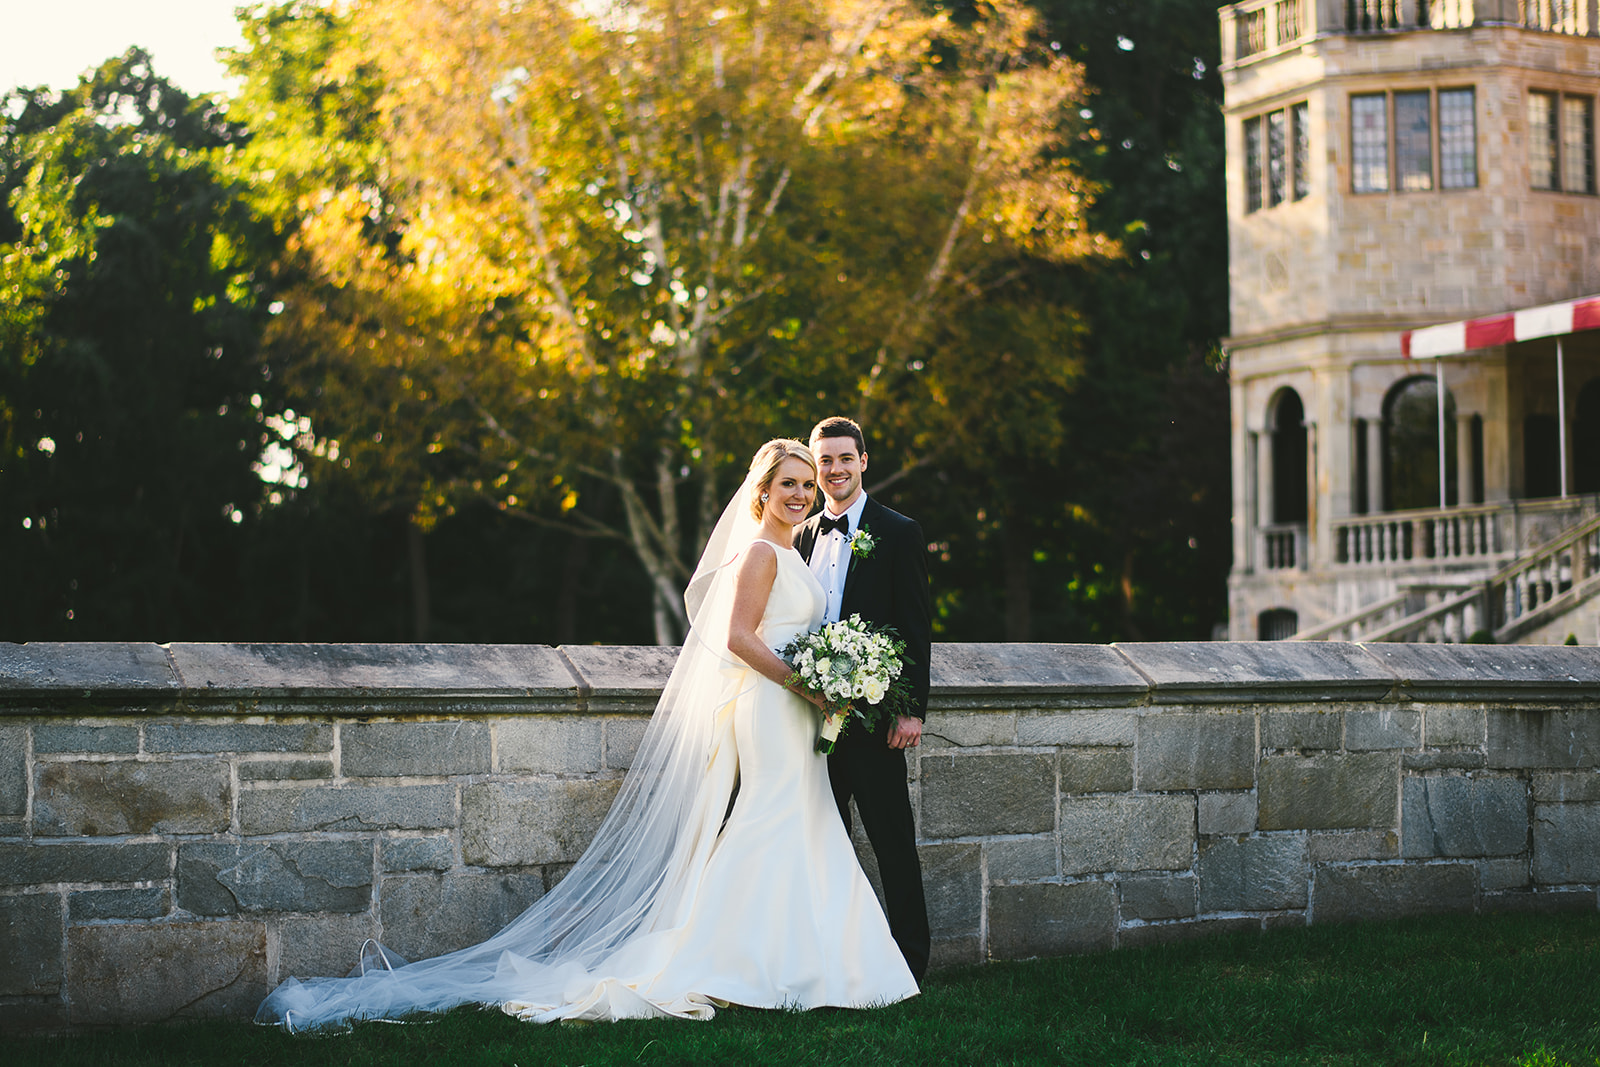 15 bride and groom at Bellarmine Hall Fairfield University wedding.jpg